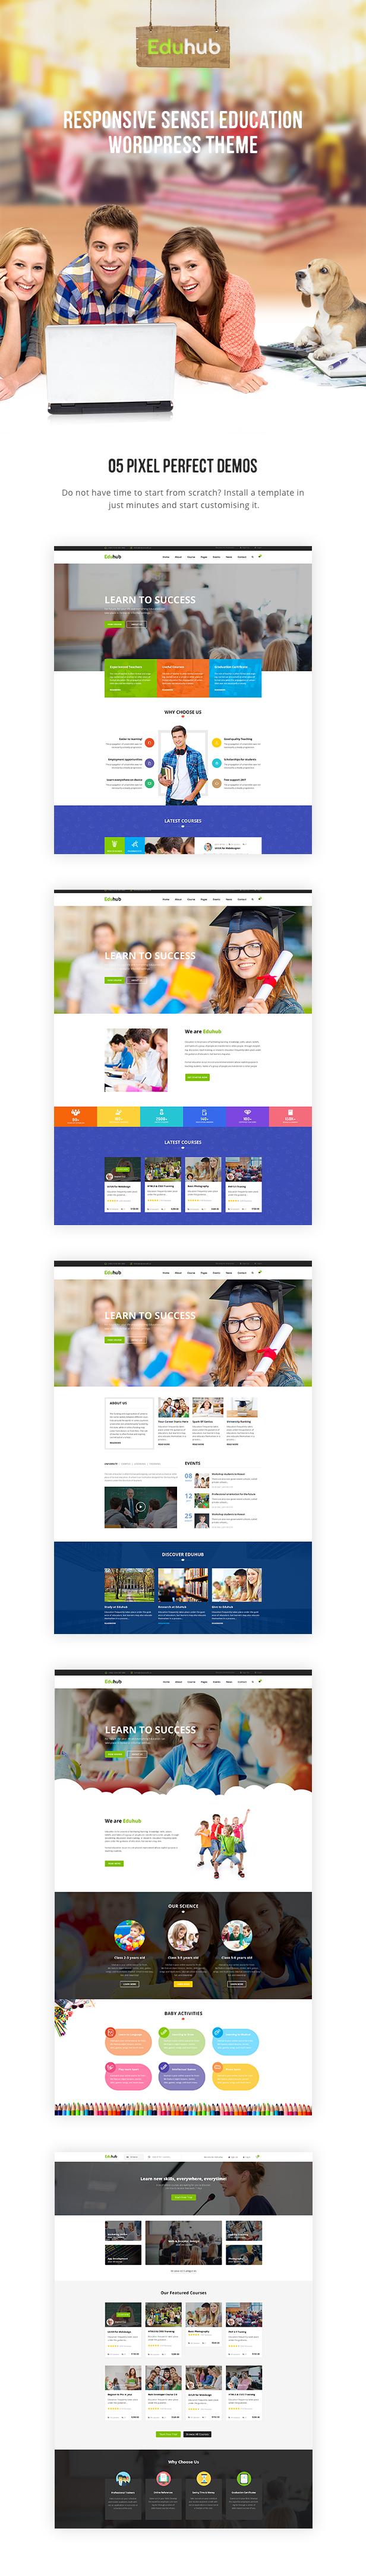 Eduhub - Responsive Sensei Bildung WordPress Layout